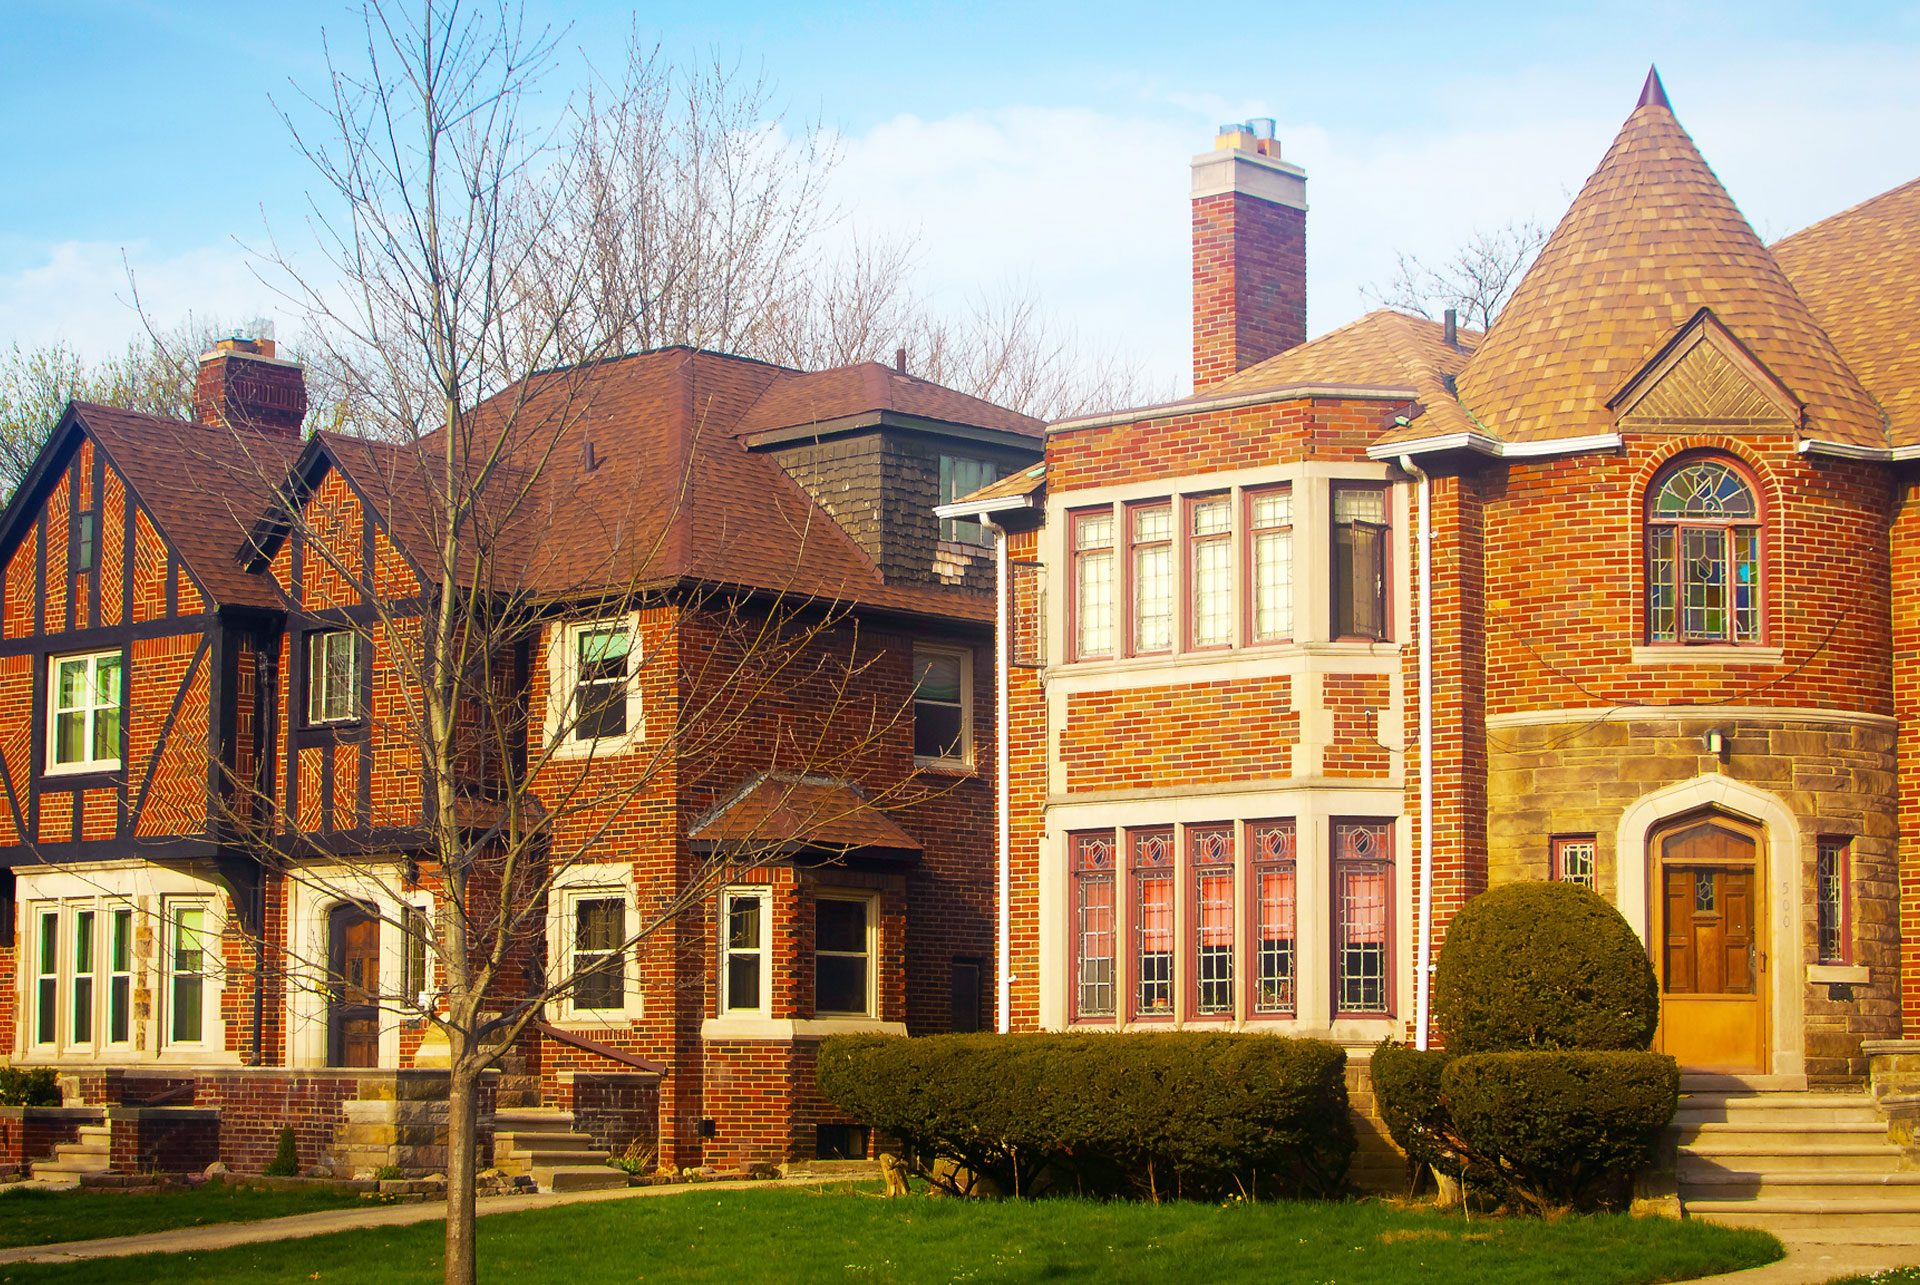 Gross Pointe Michigan Detroit Brownstone Image